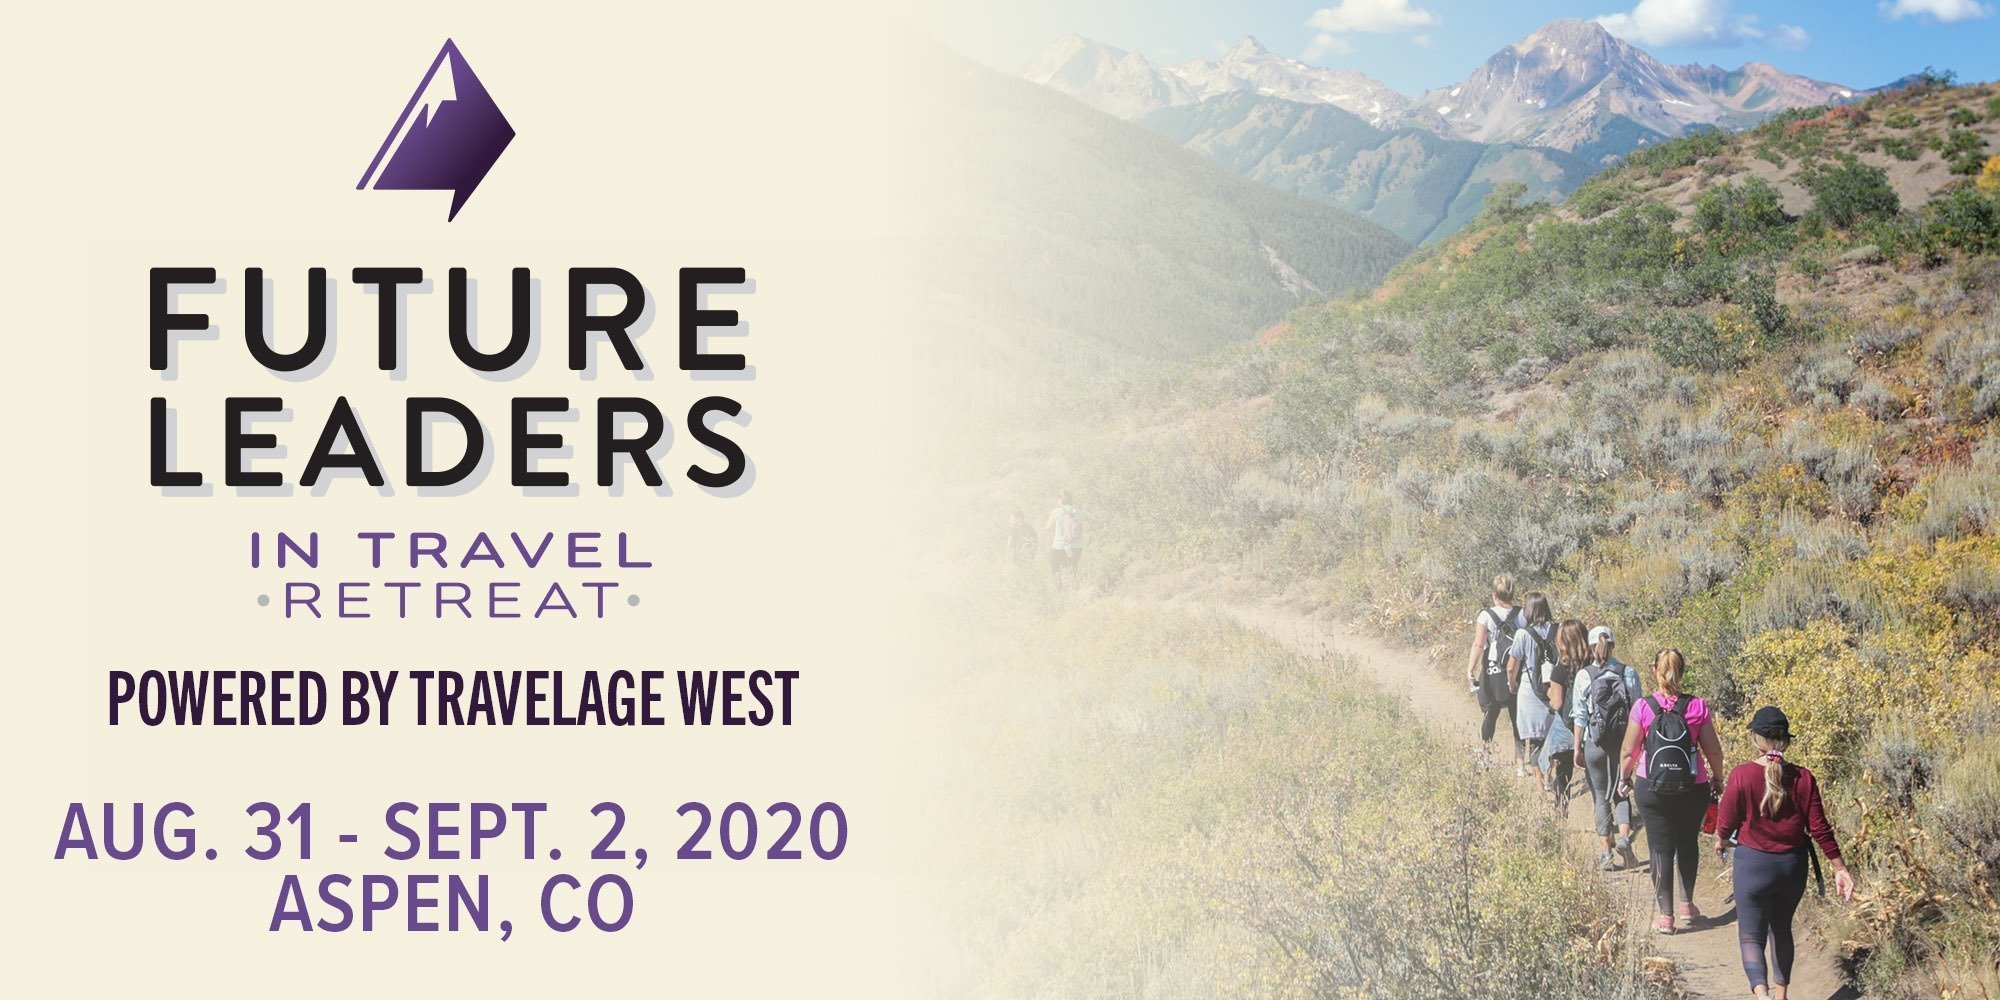 Future Leaders in Travel Retreat